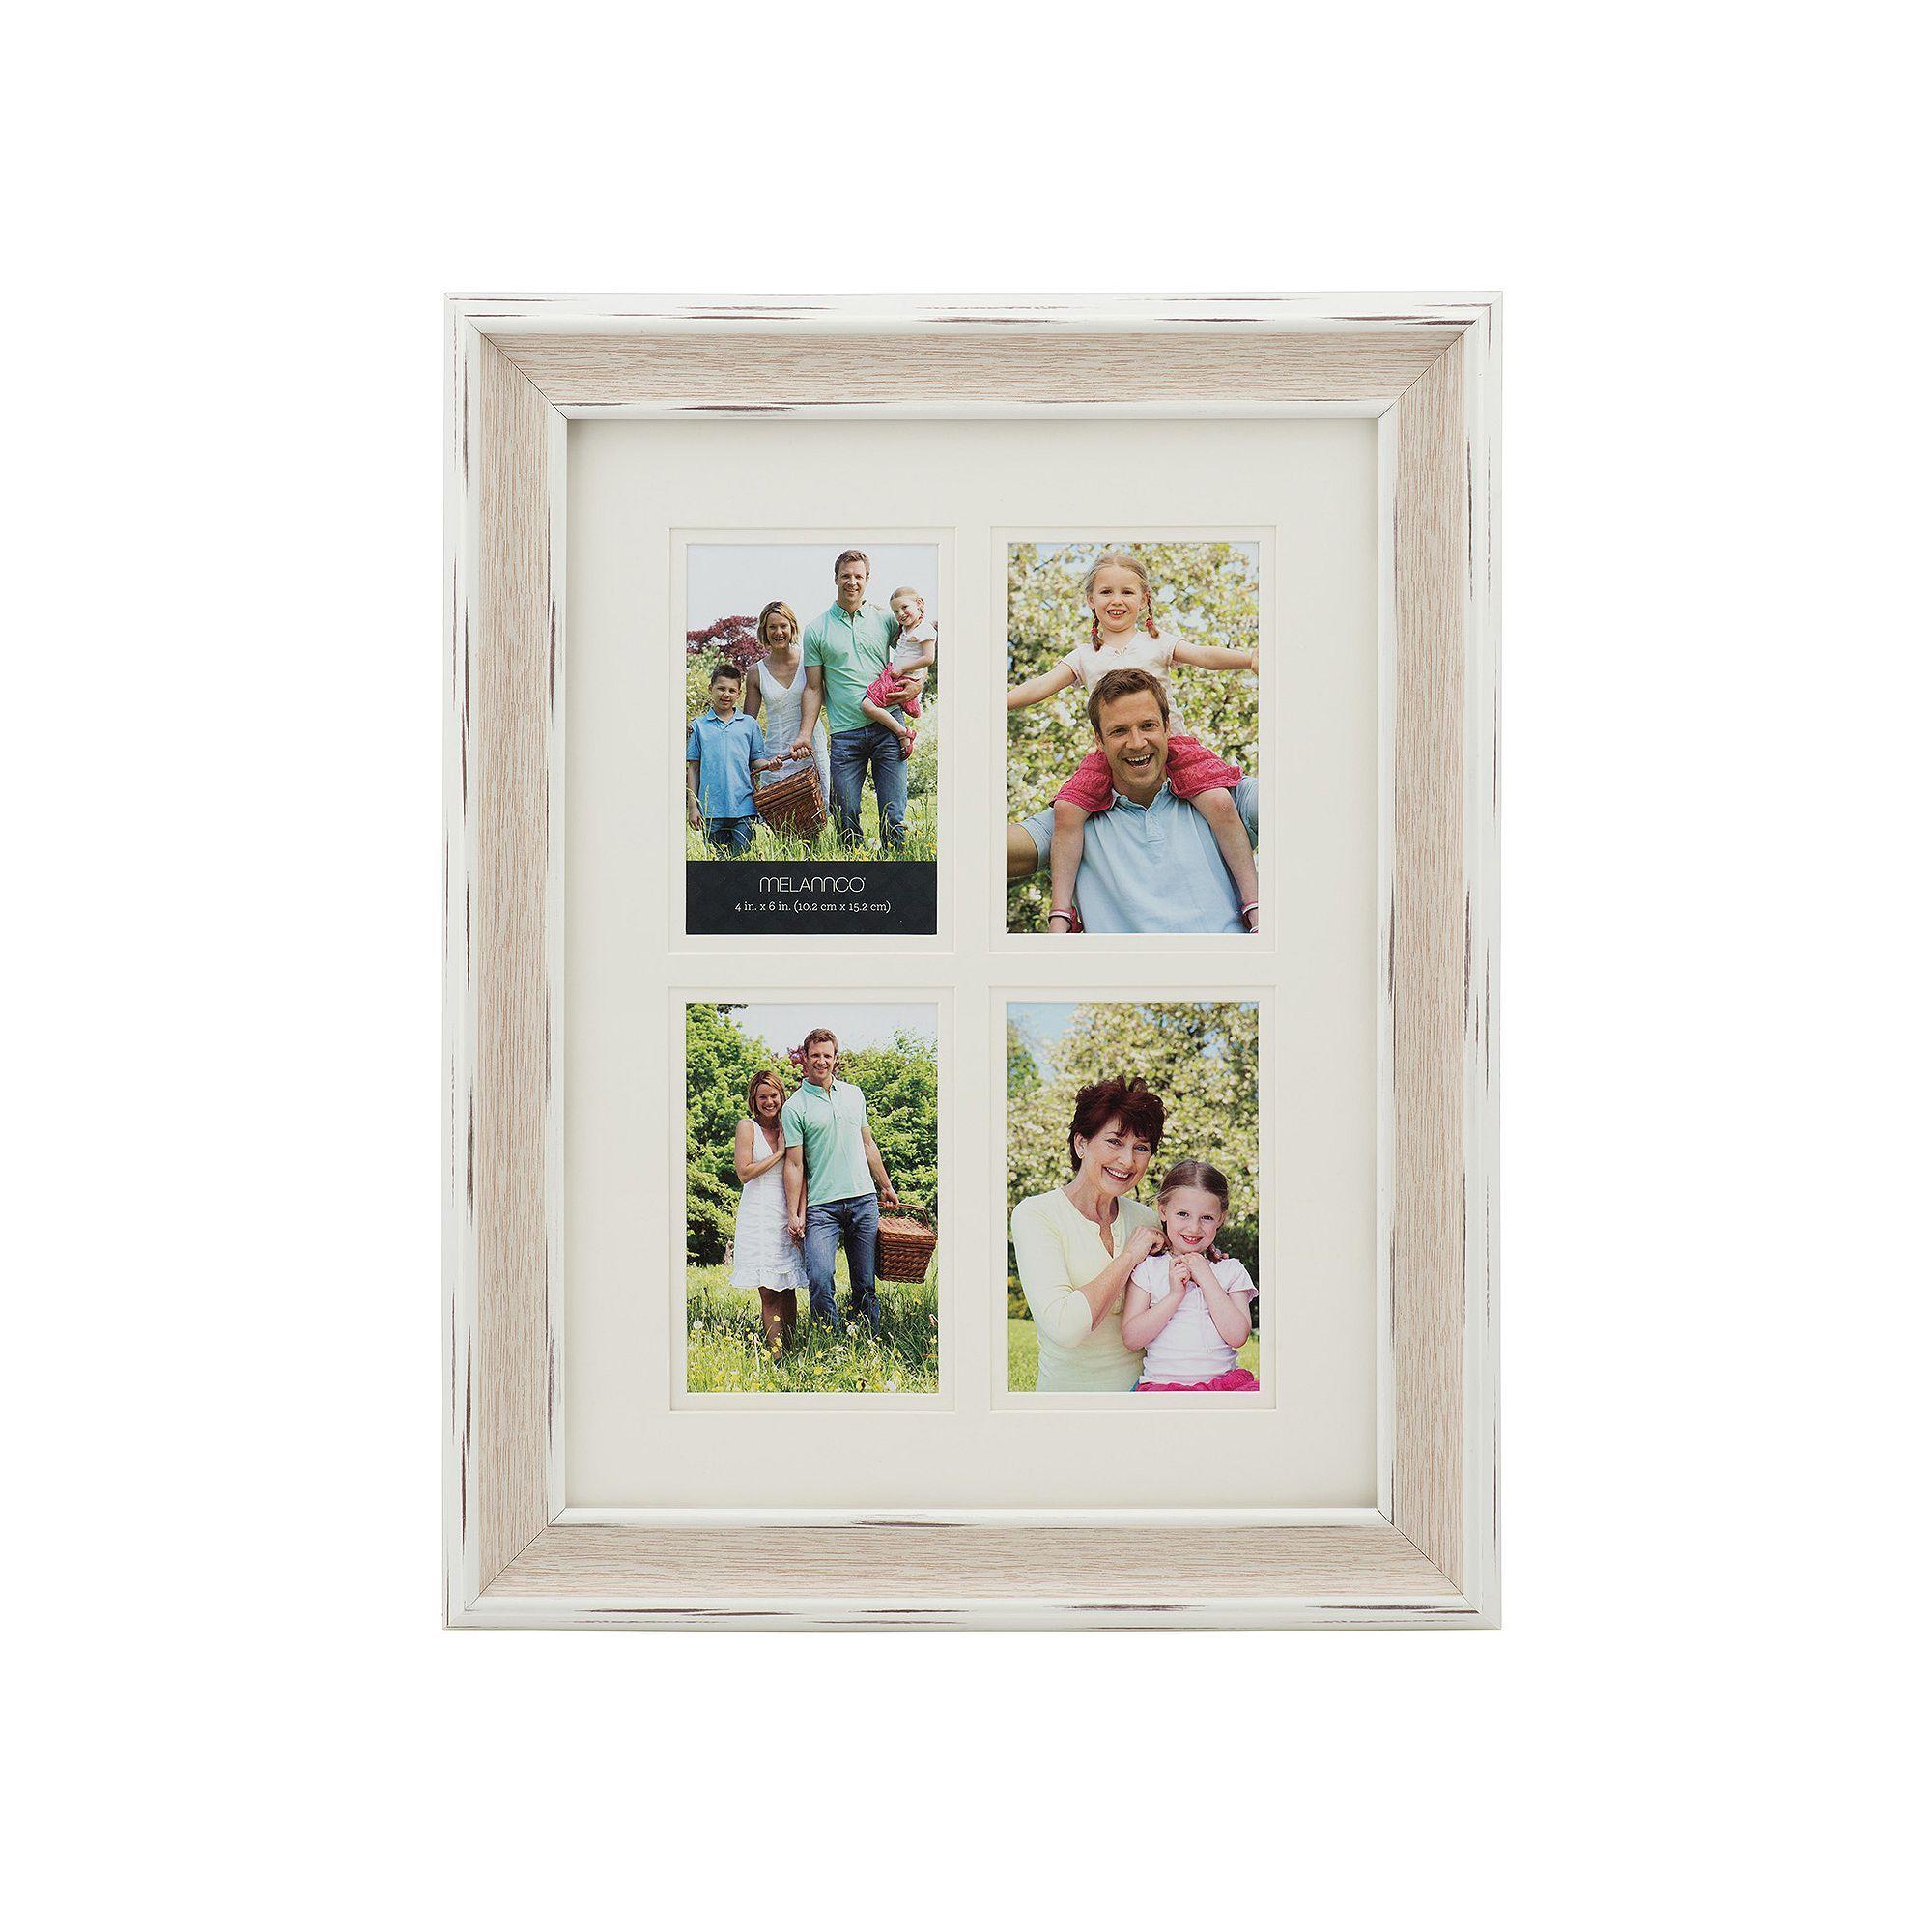 Melannco 4-Opening 4 x 6 Wood Grain Collage Frame | Pinterest | Wood ...